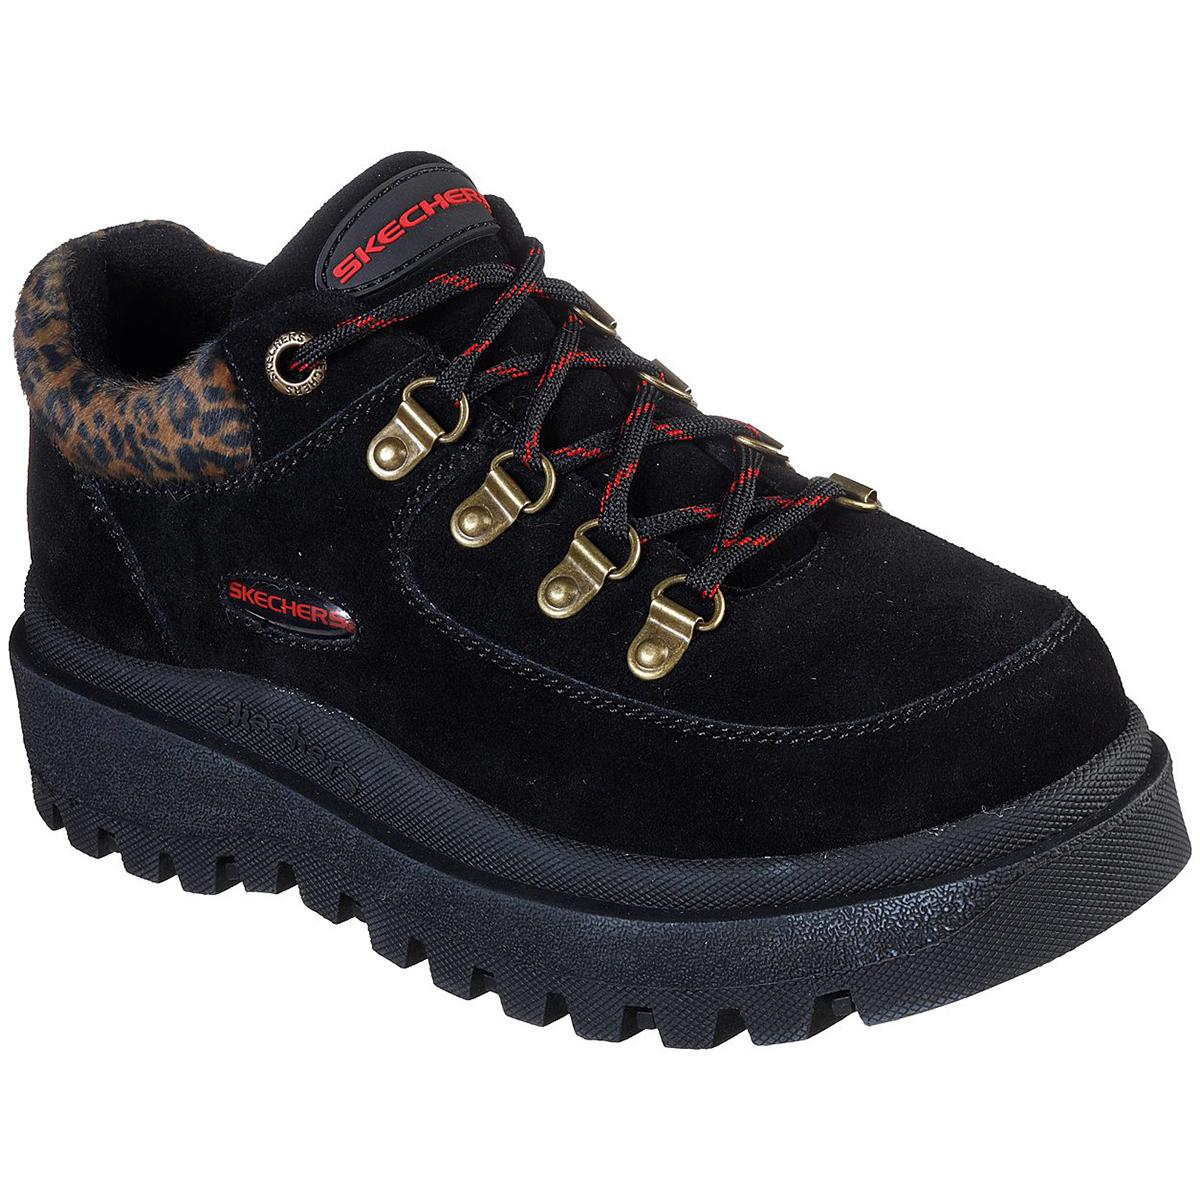 Skechers Women's Shindigs Growl Boots - Black, 7